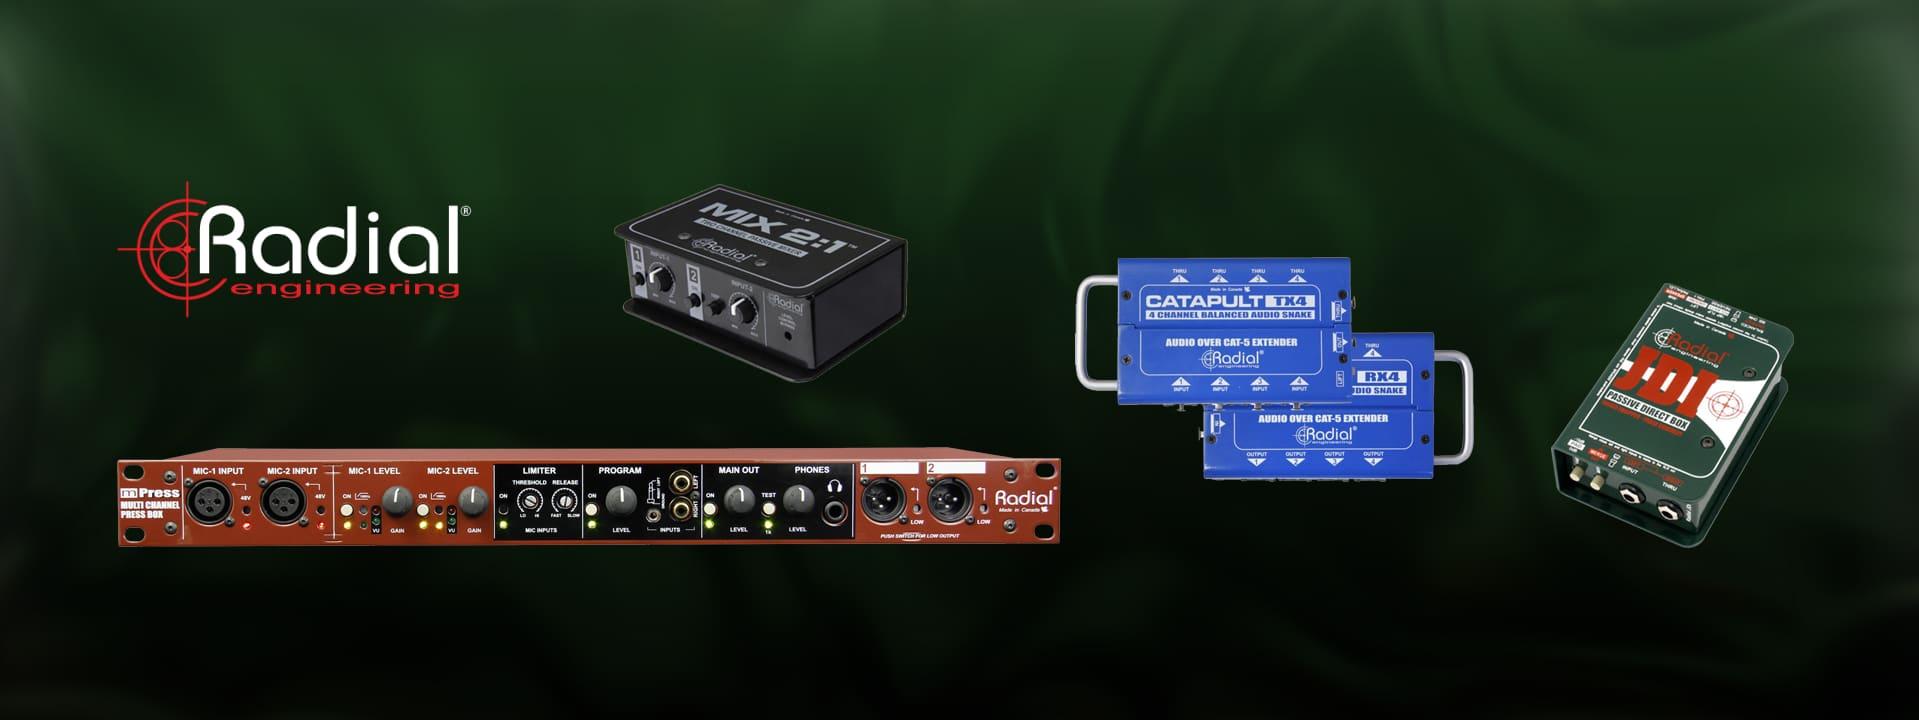 Radial Engineering live and studio tools